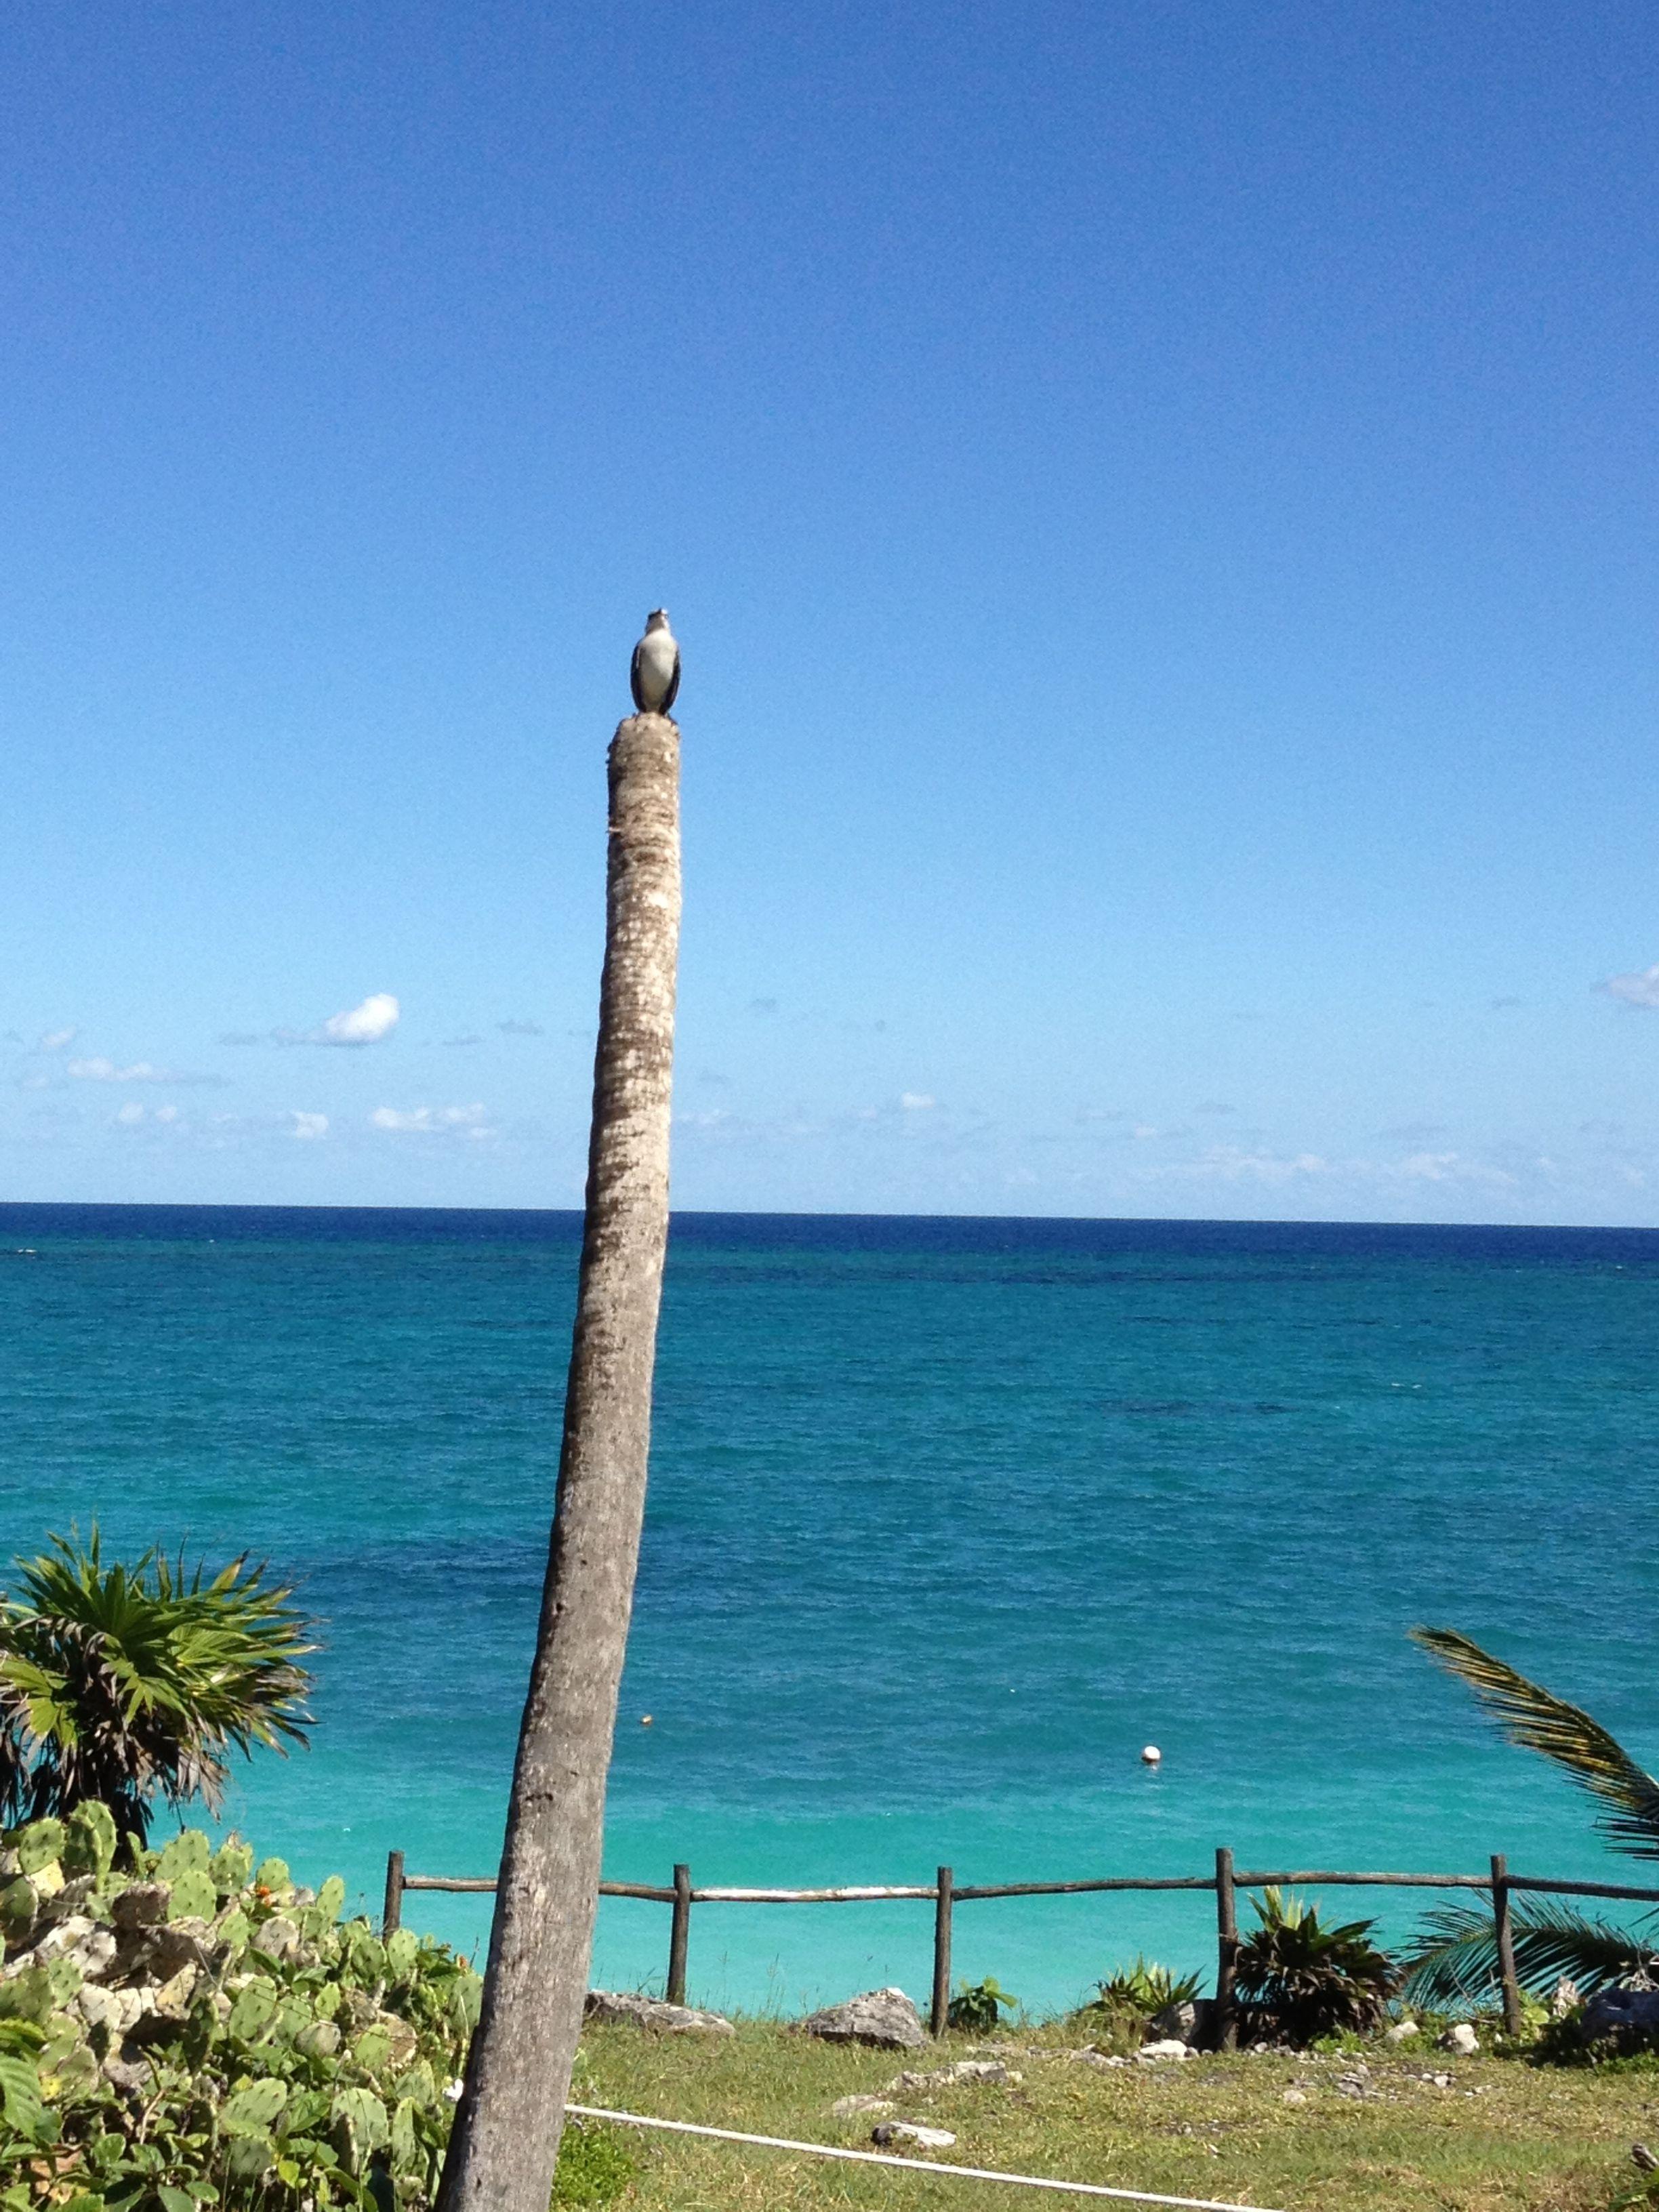 9500 Miramar Rd: Tulum, #QuintanaRoo, #Mexico.